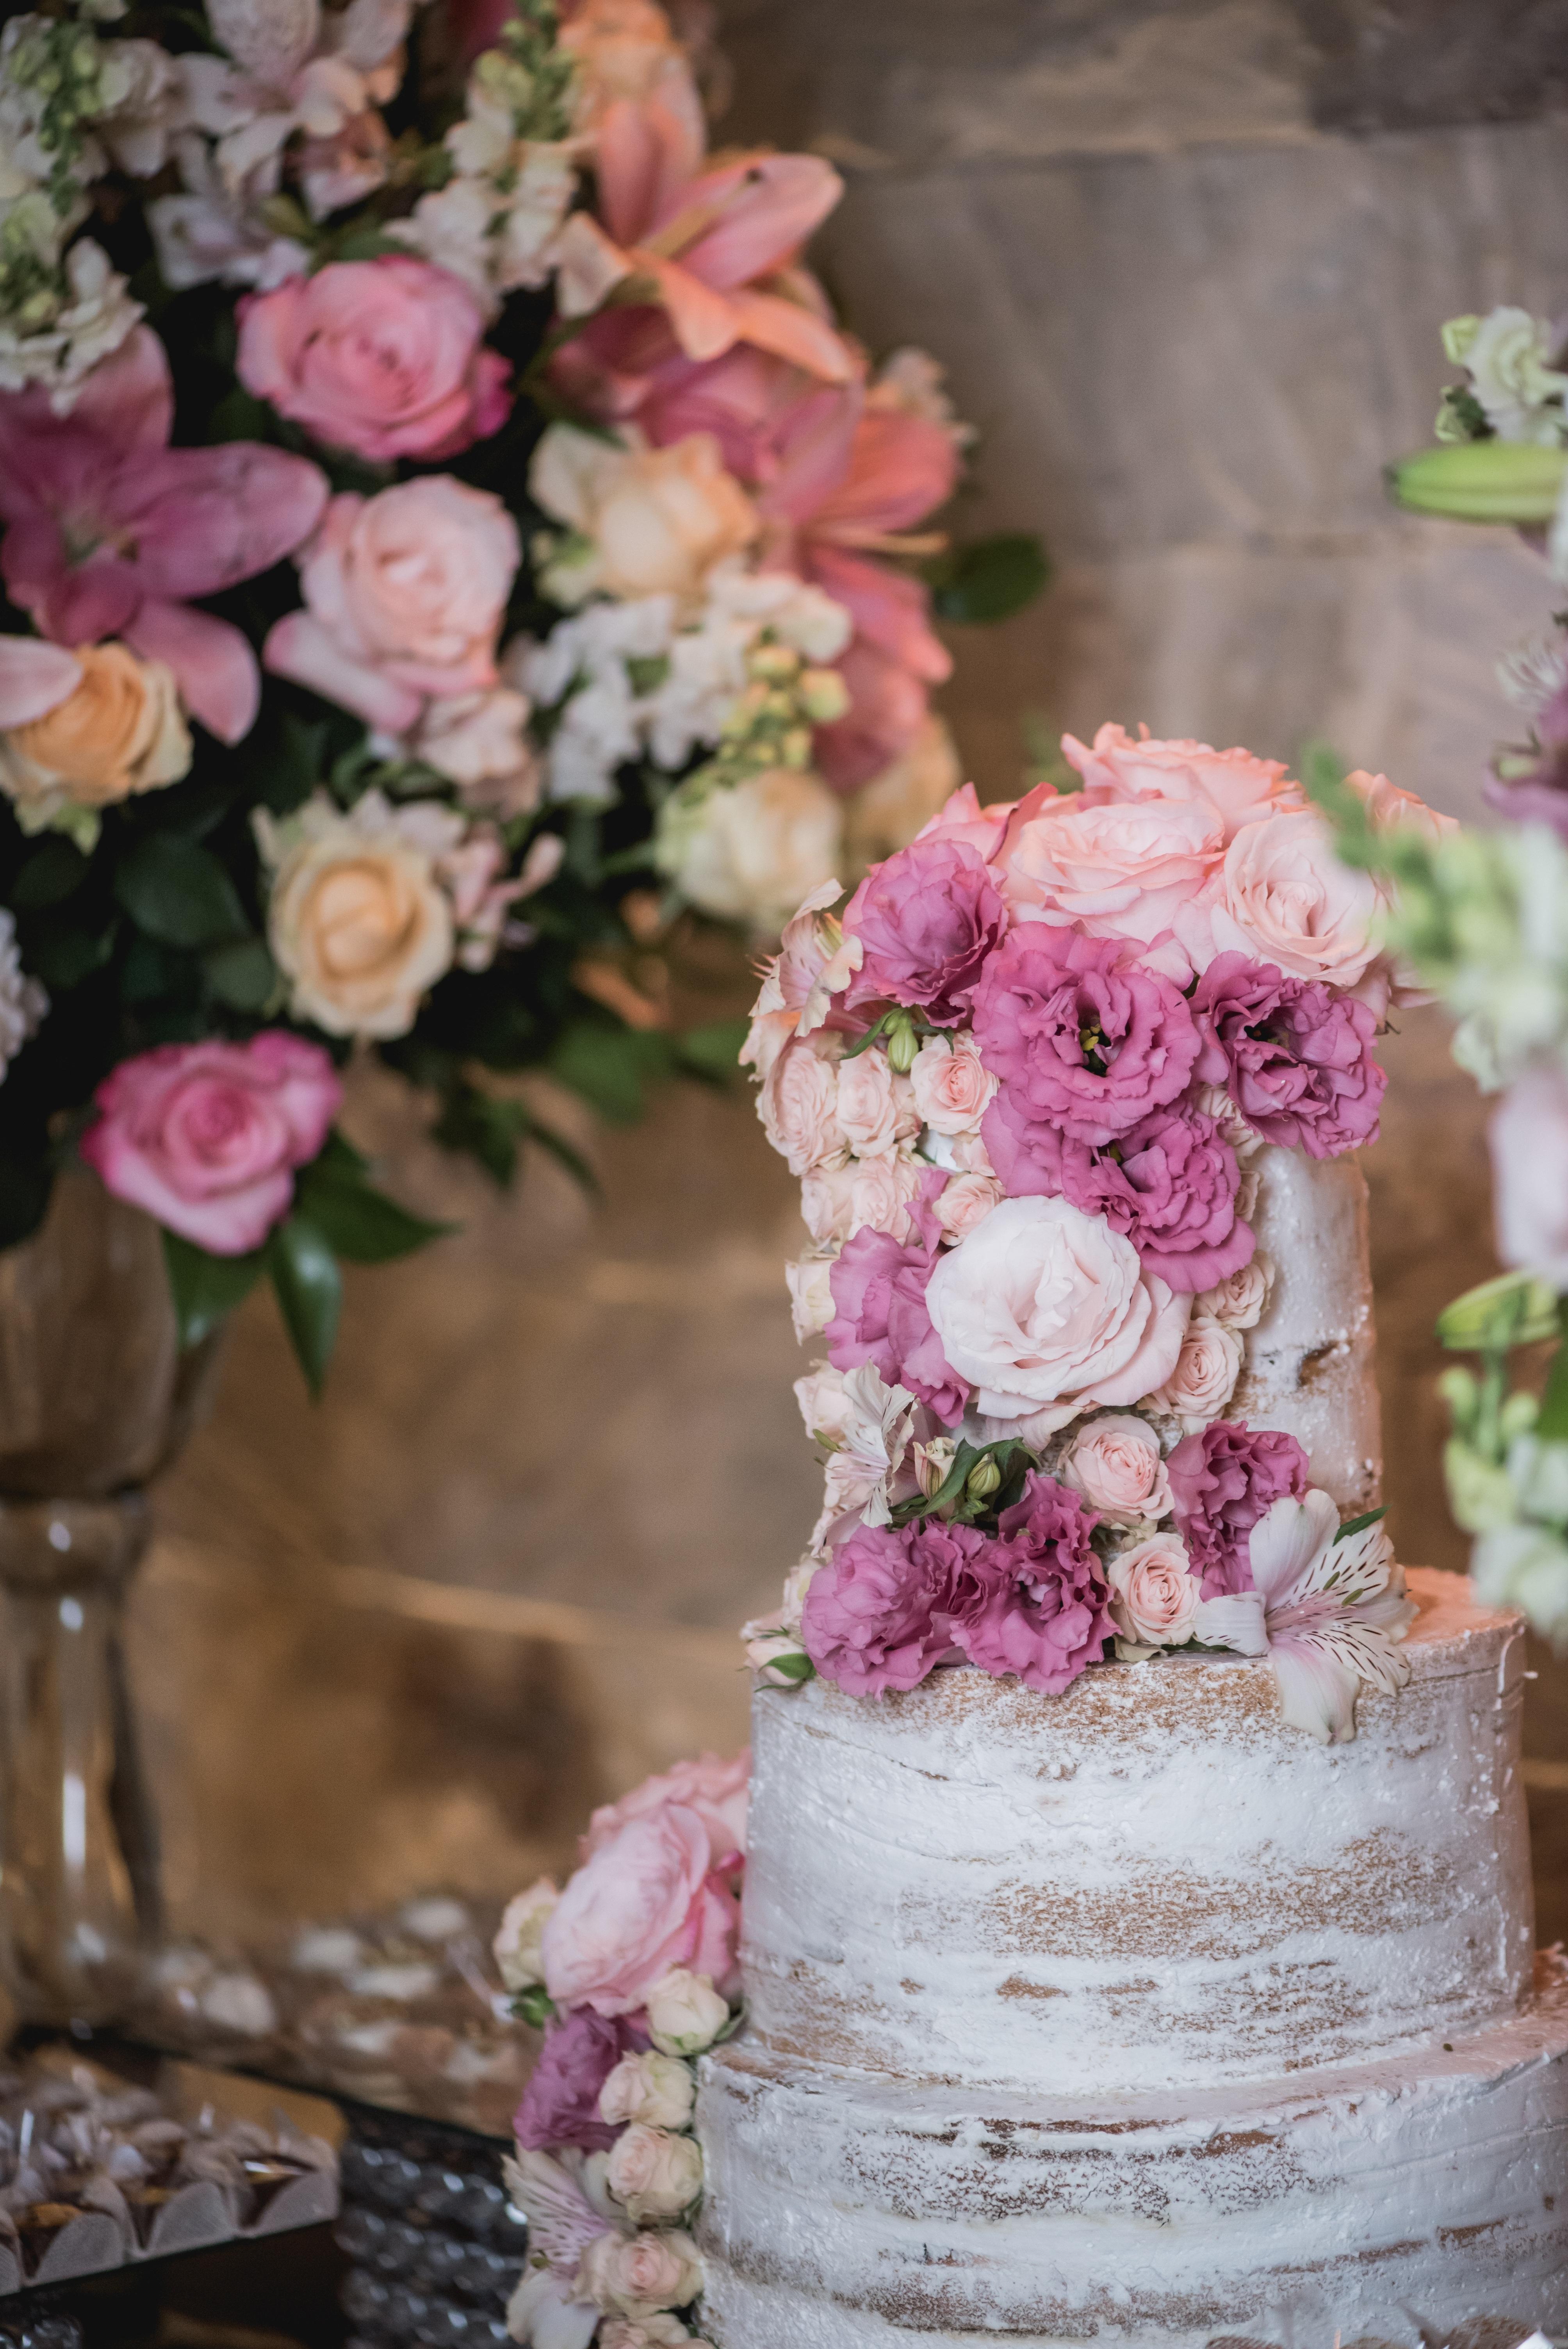 Fotos gratis : planta, flor, primavera, rosado, Boda, novia ...